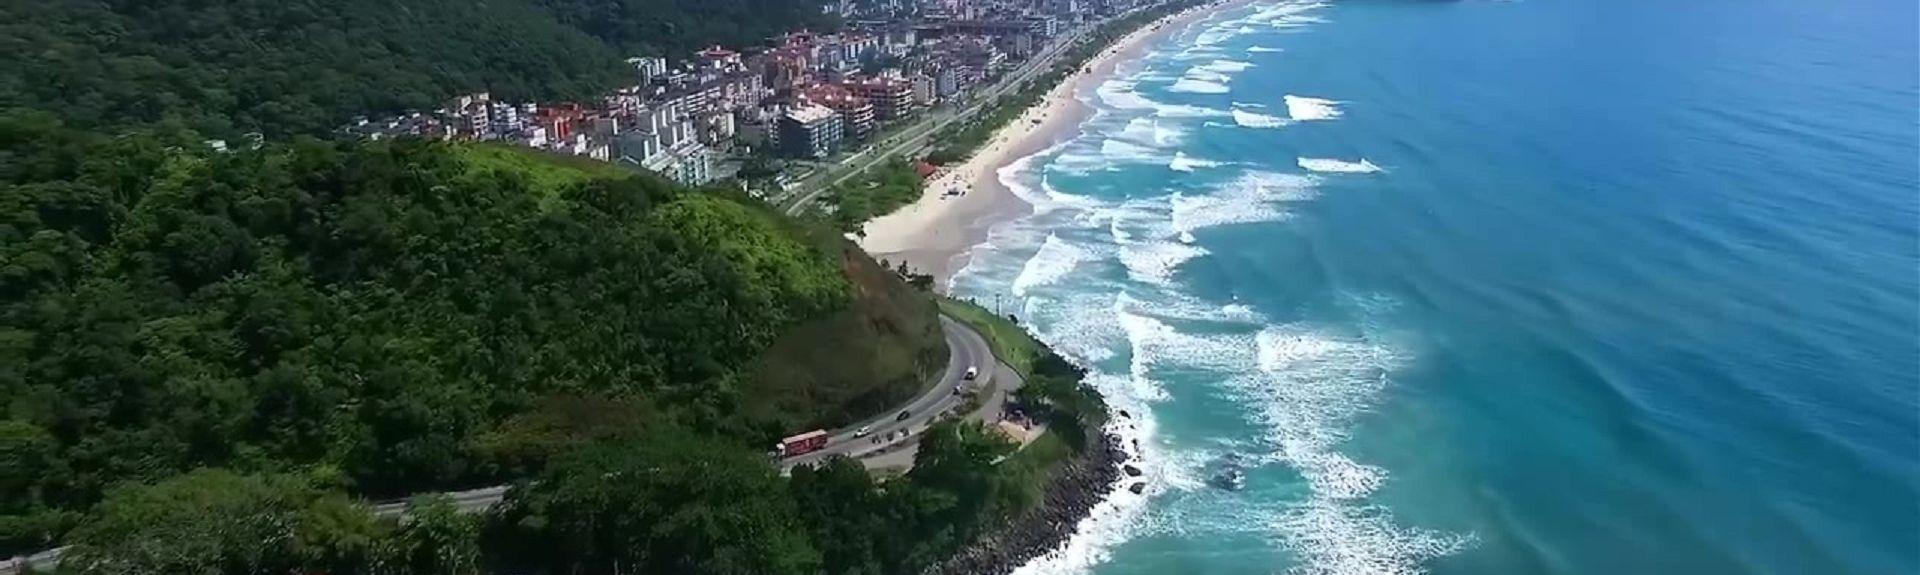 Maranduba Beach, Ubatuba, Brazil